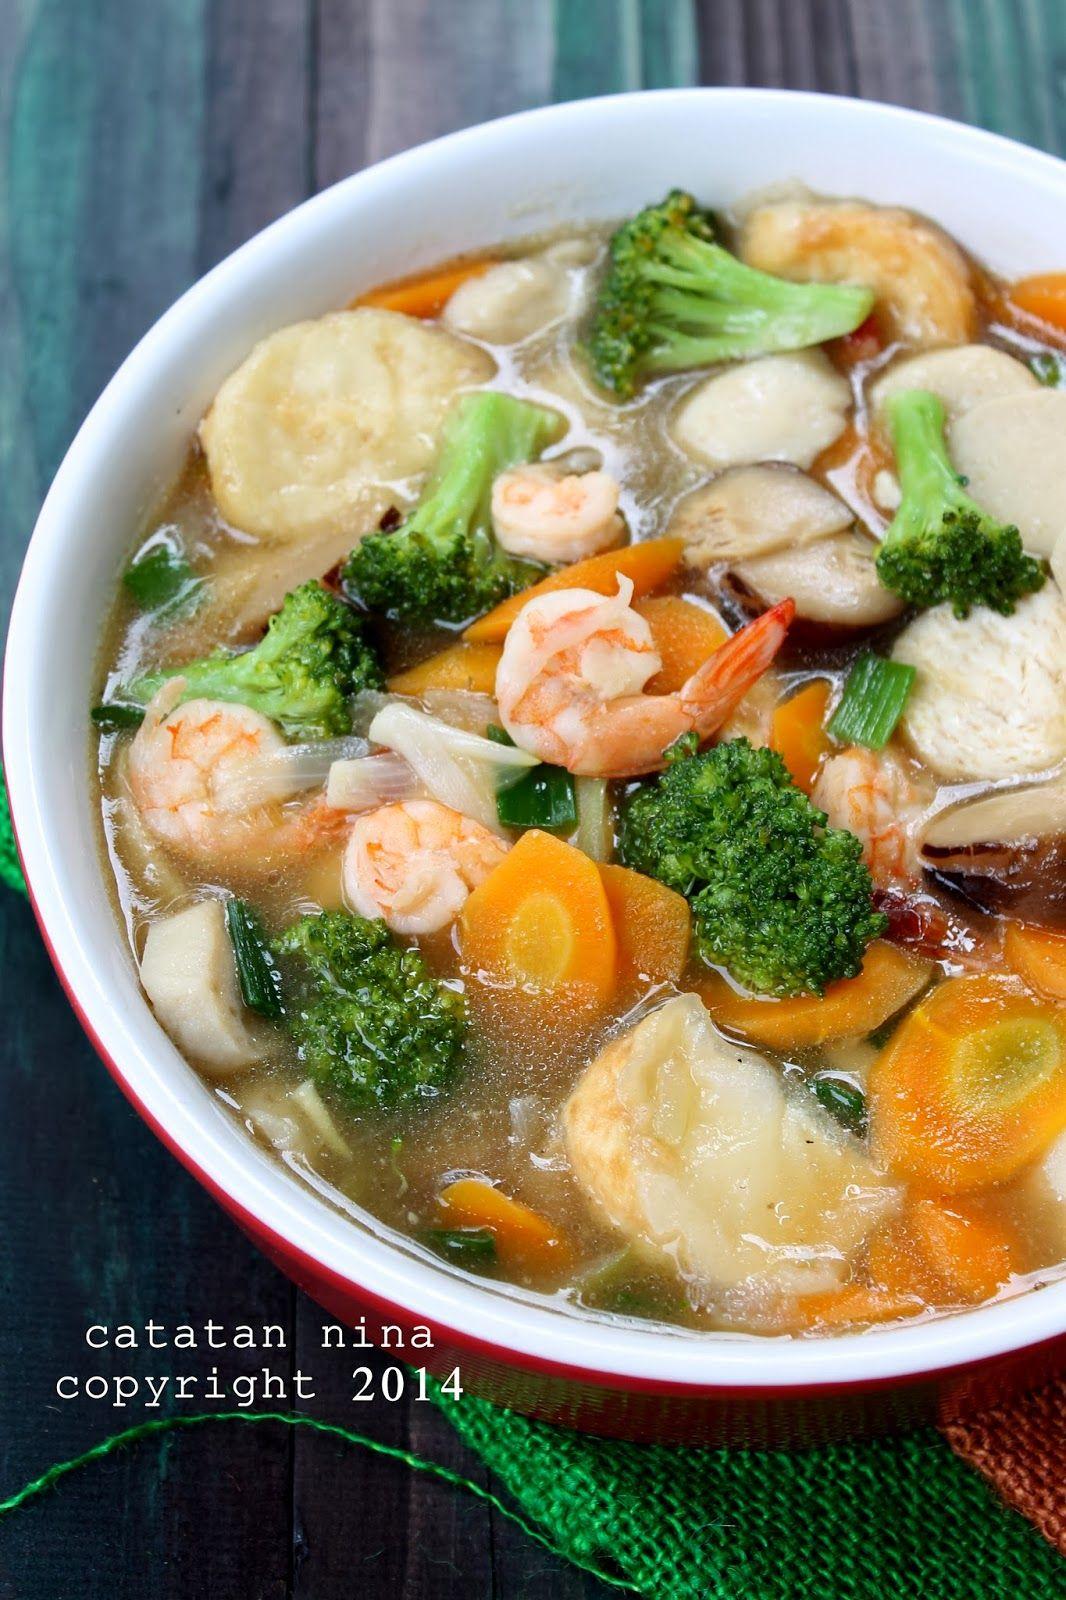 Catatan Nina Sapo Tahu Udang Resep Masakan Cina Resep Masakan Jepang Resep Makanan Cina